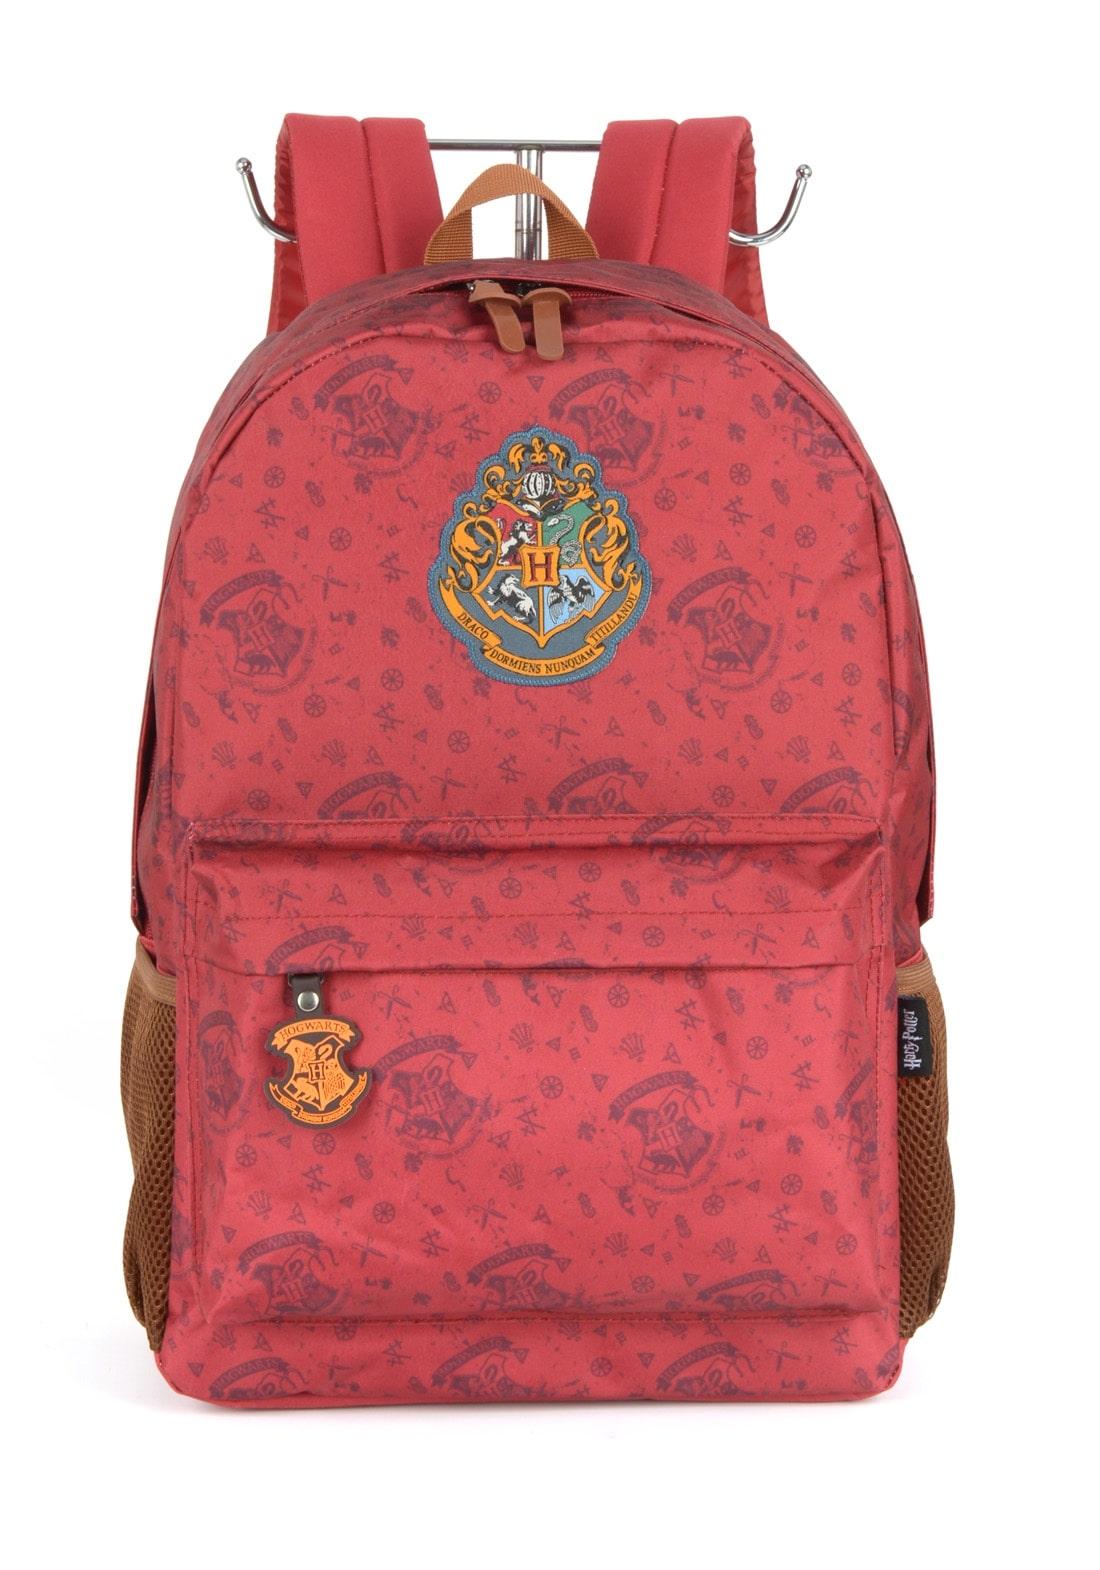 Mochila Harry Potter Vermelha